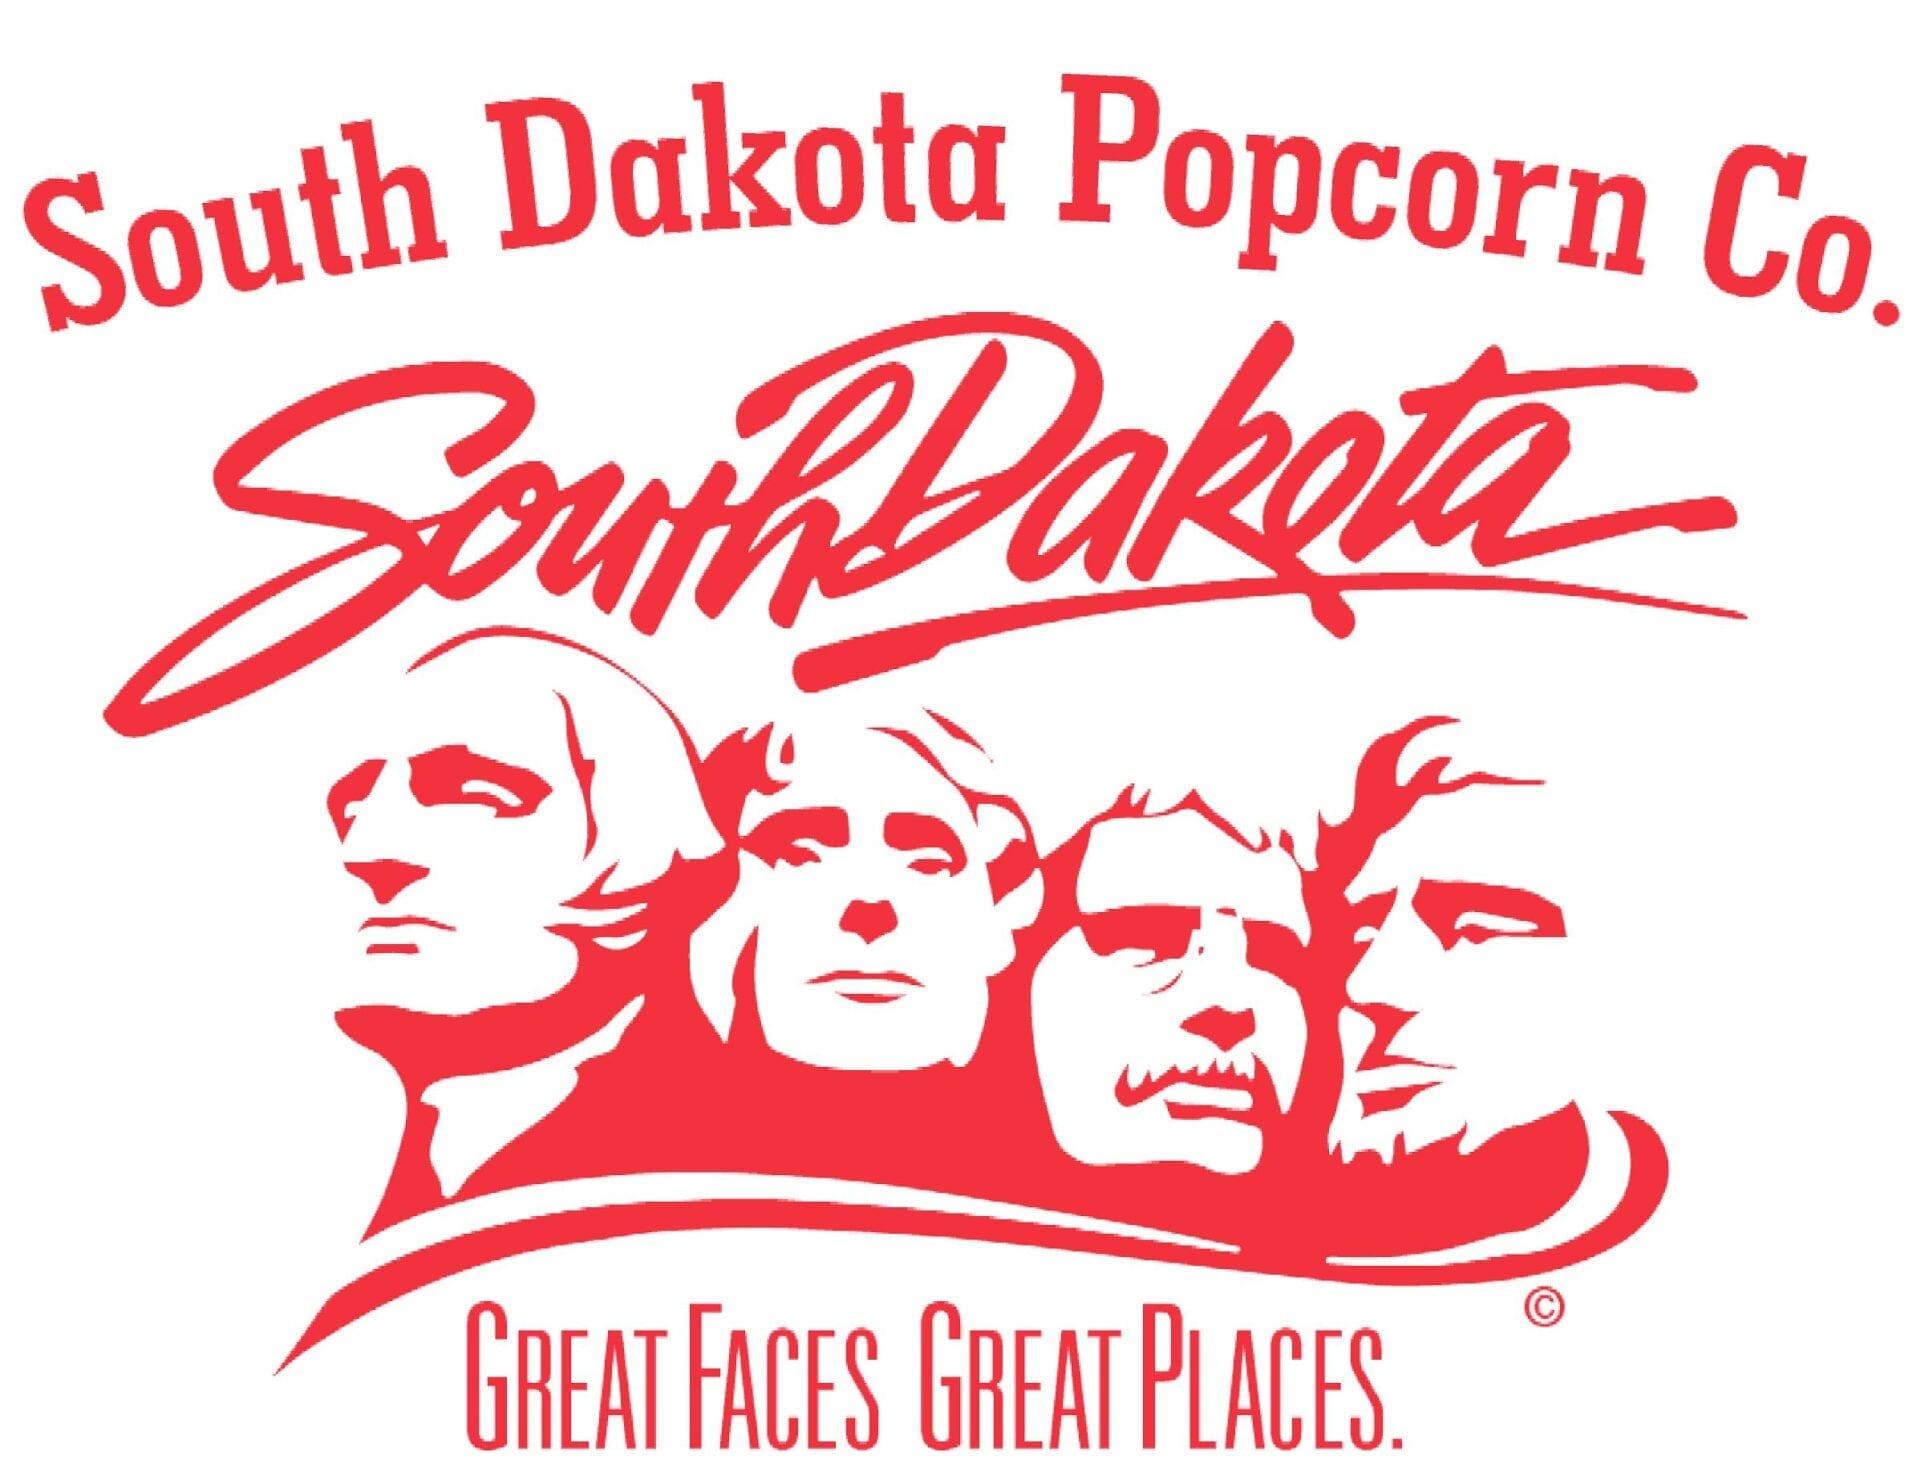 South Dakota Popcorn Company